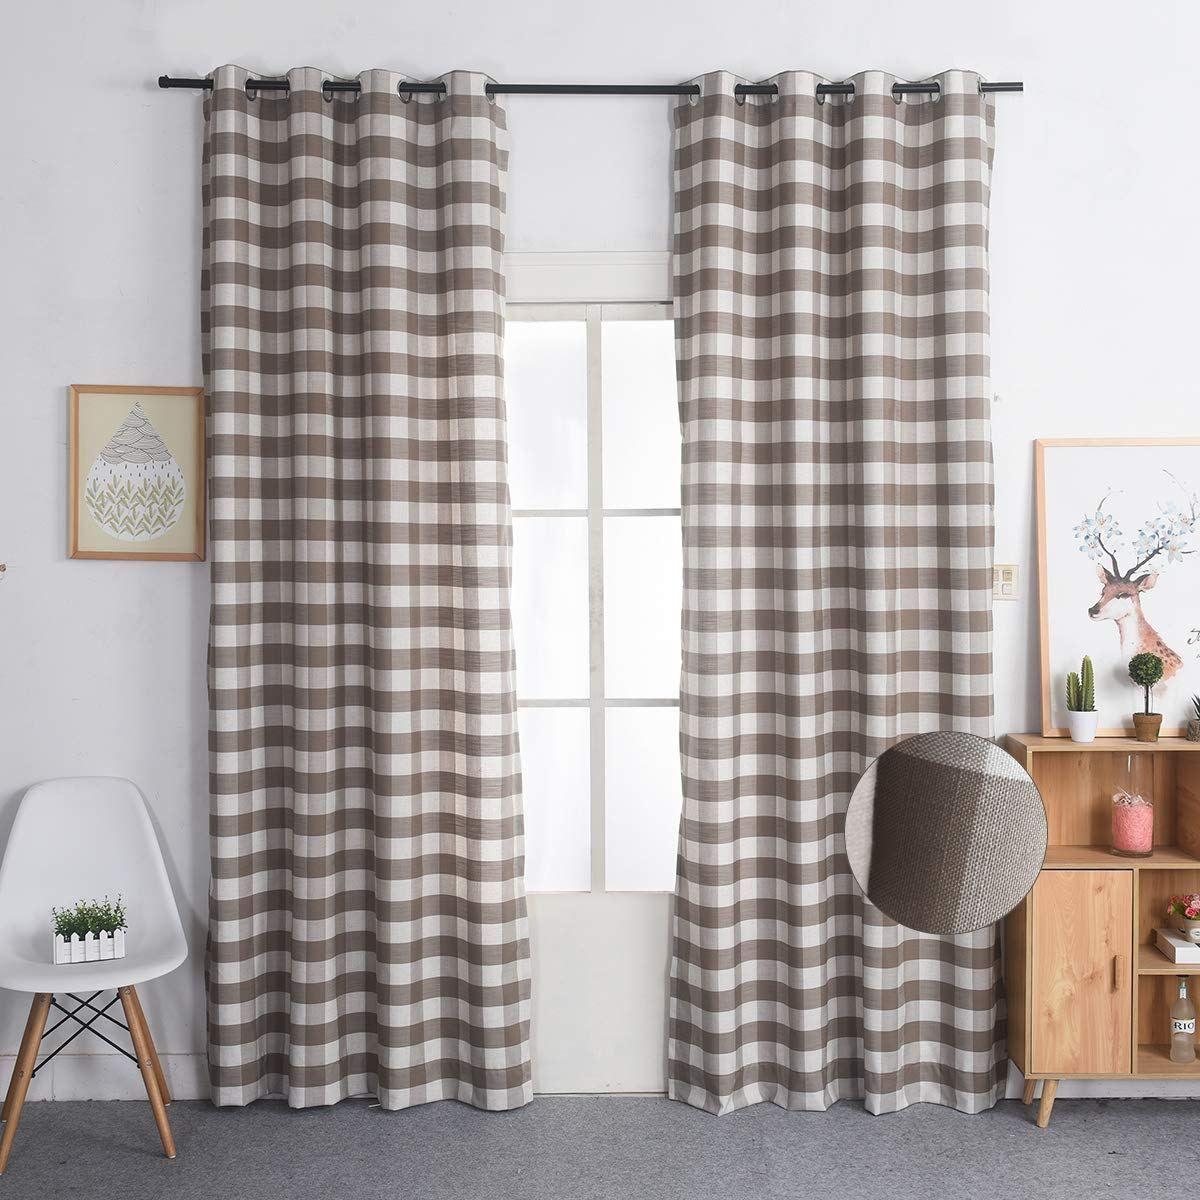 Nauxcen 100 Cotton Plaid Curtains 52 X 63 Inch 2 Panels Brown